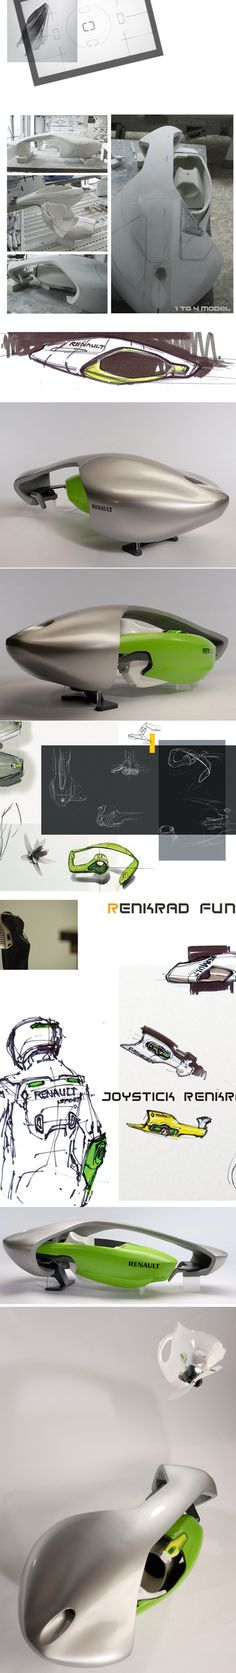 Futuristic Concept Car by Nick Pugh